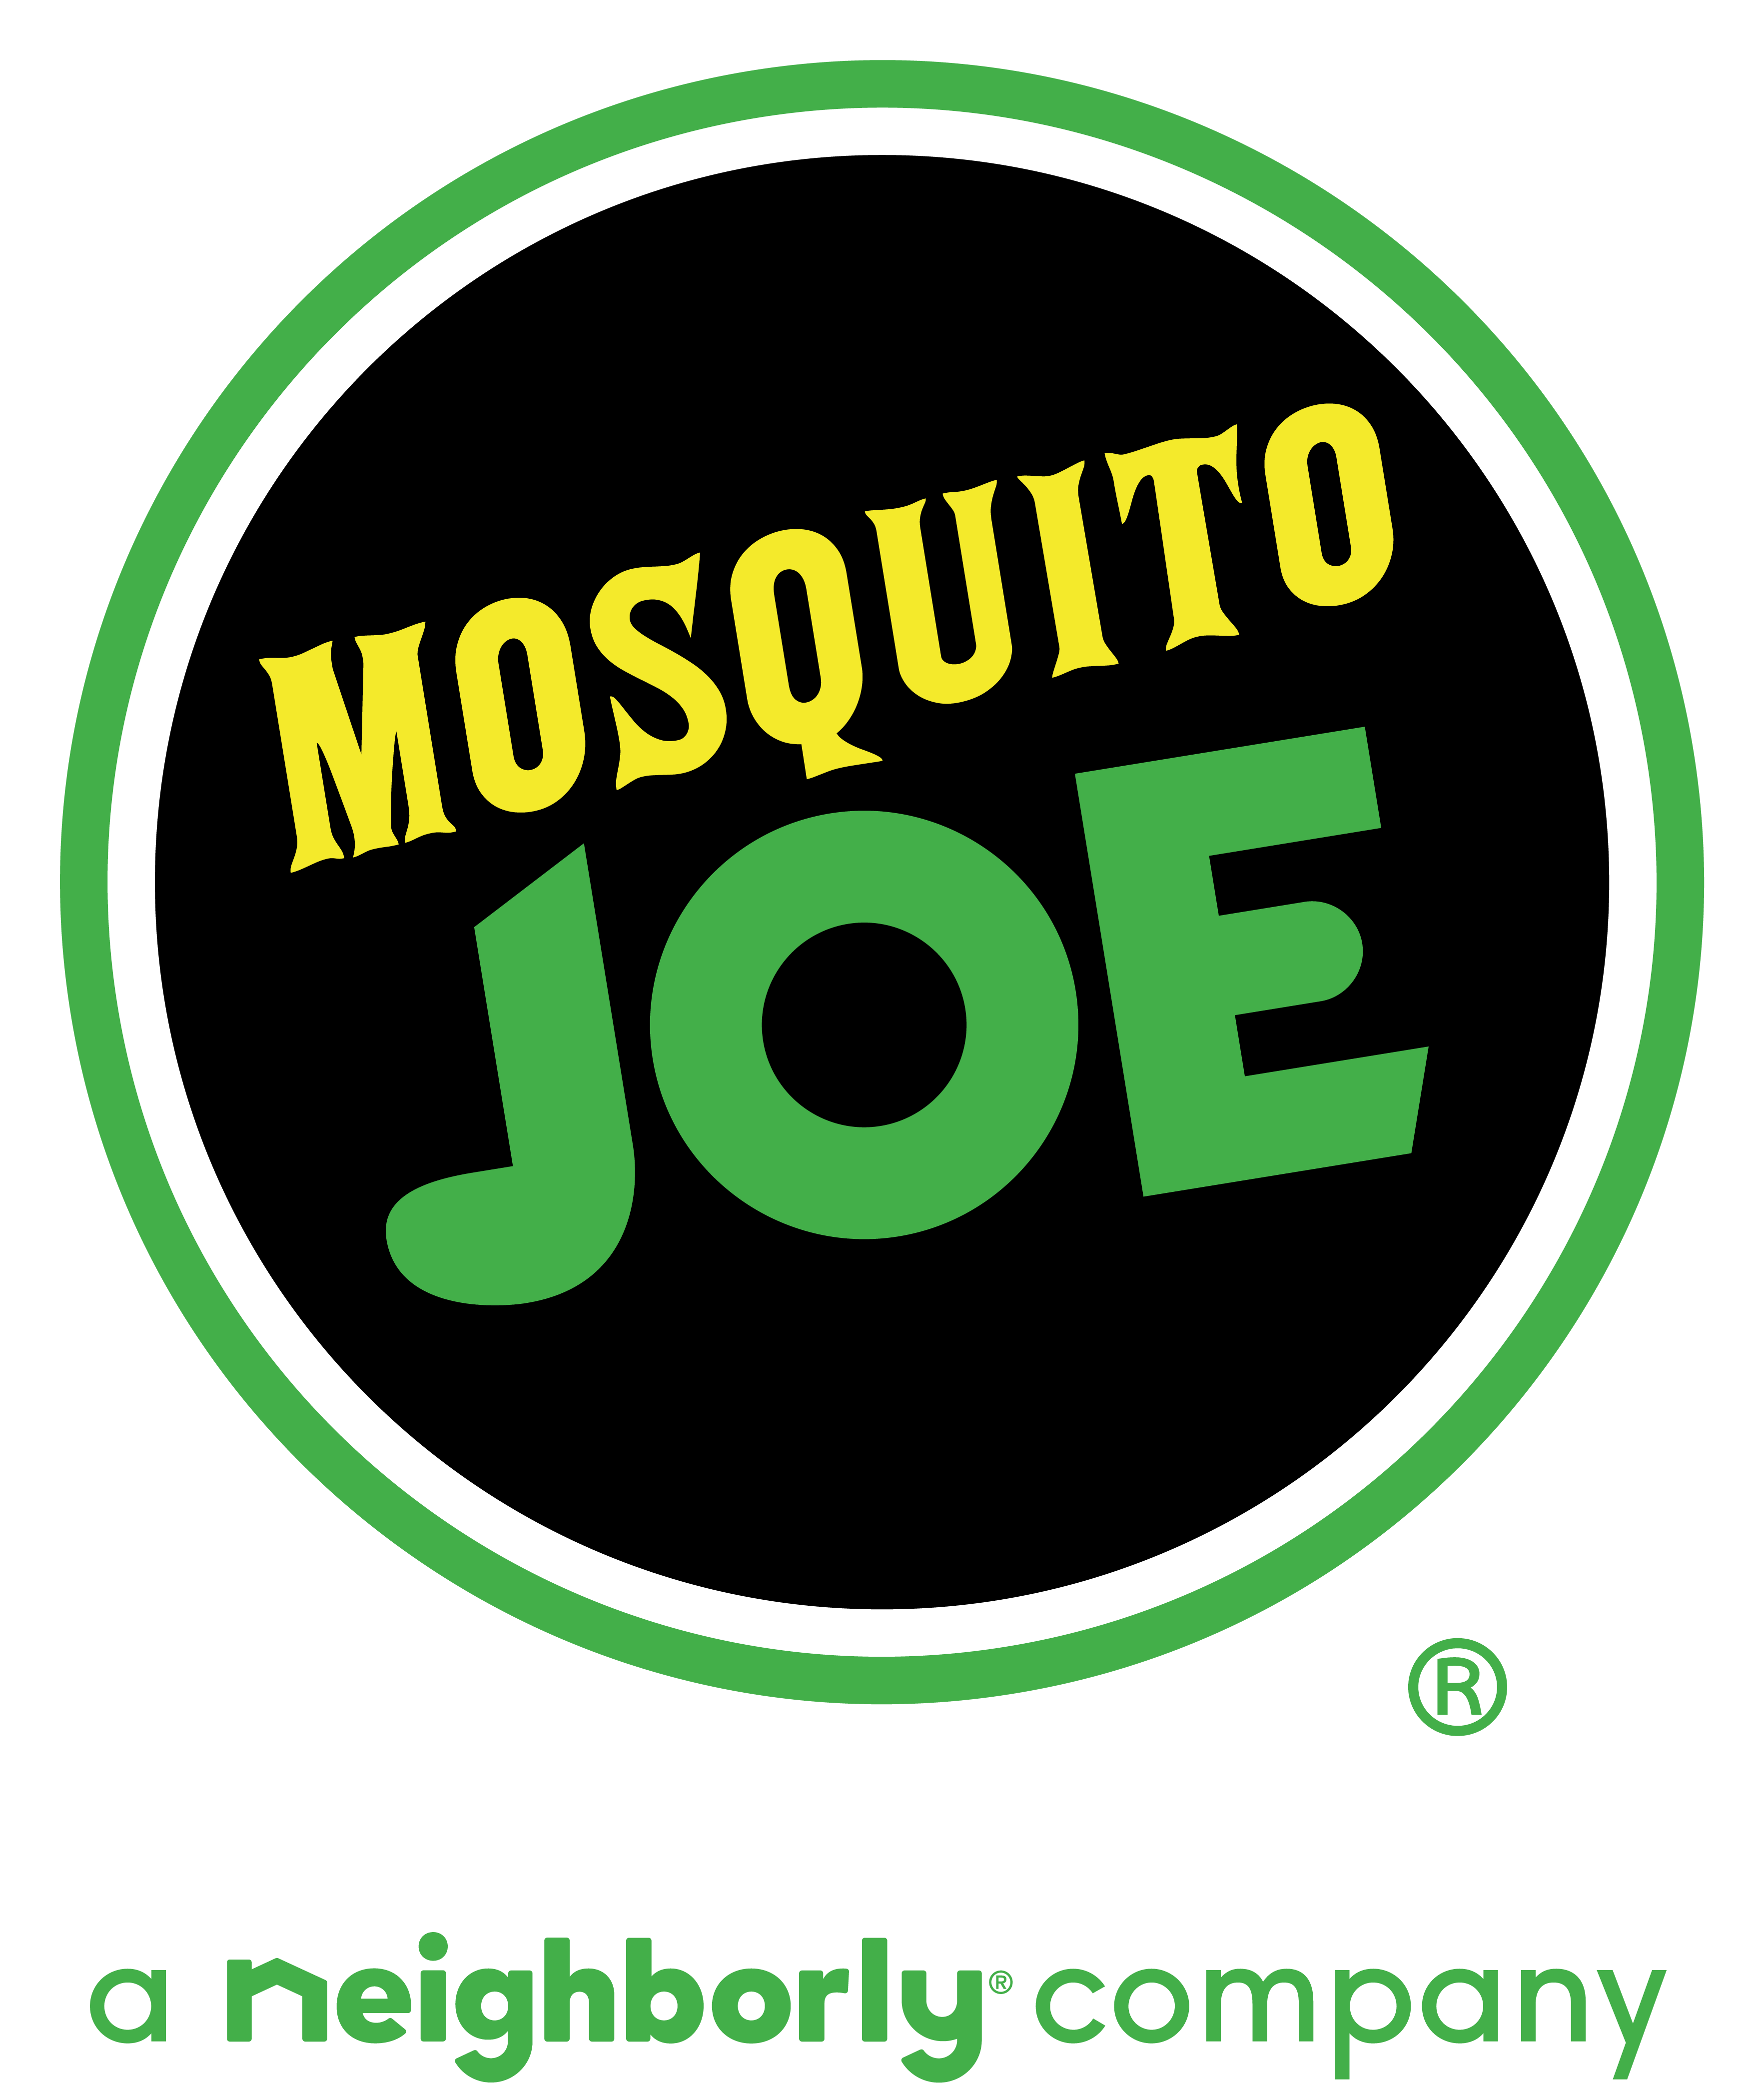 Mosquito Joe Careers